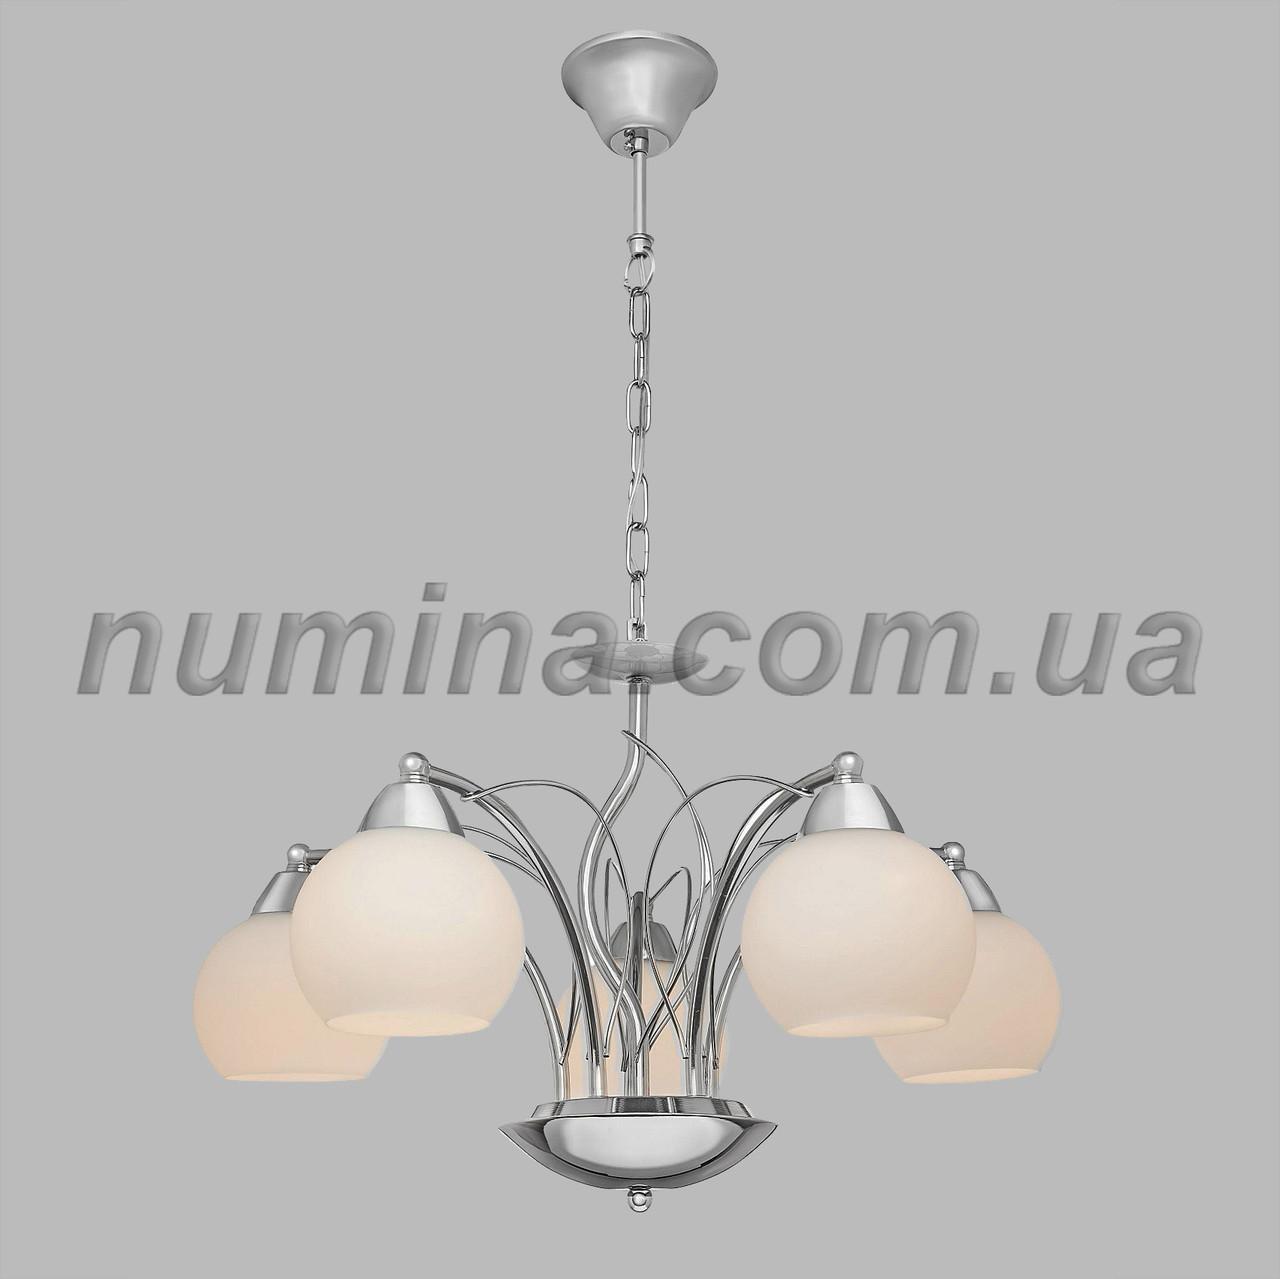 Люстра подвесная на пять ламп 29-A609/5 CR+WT